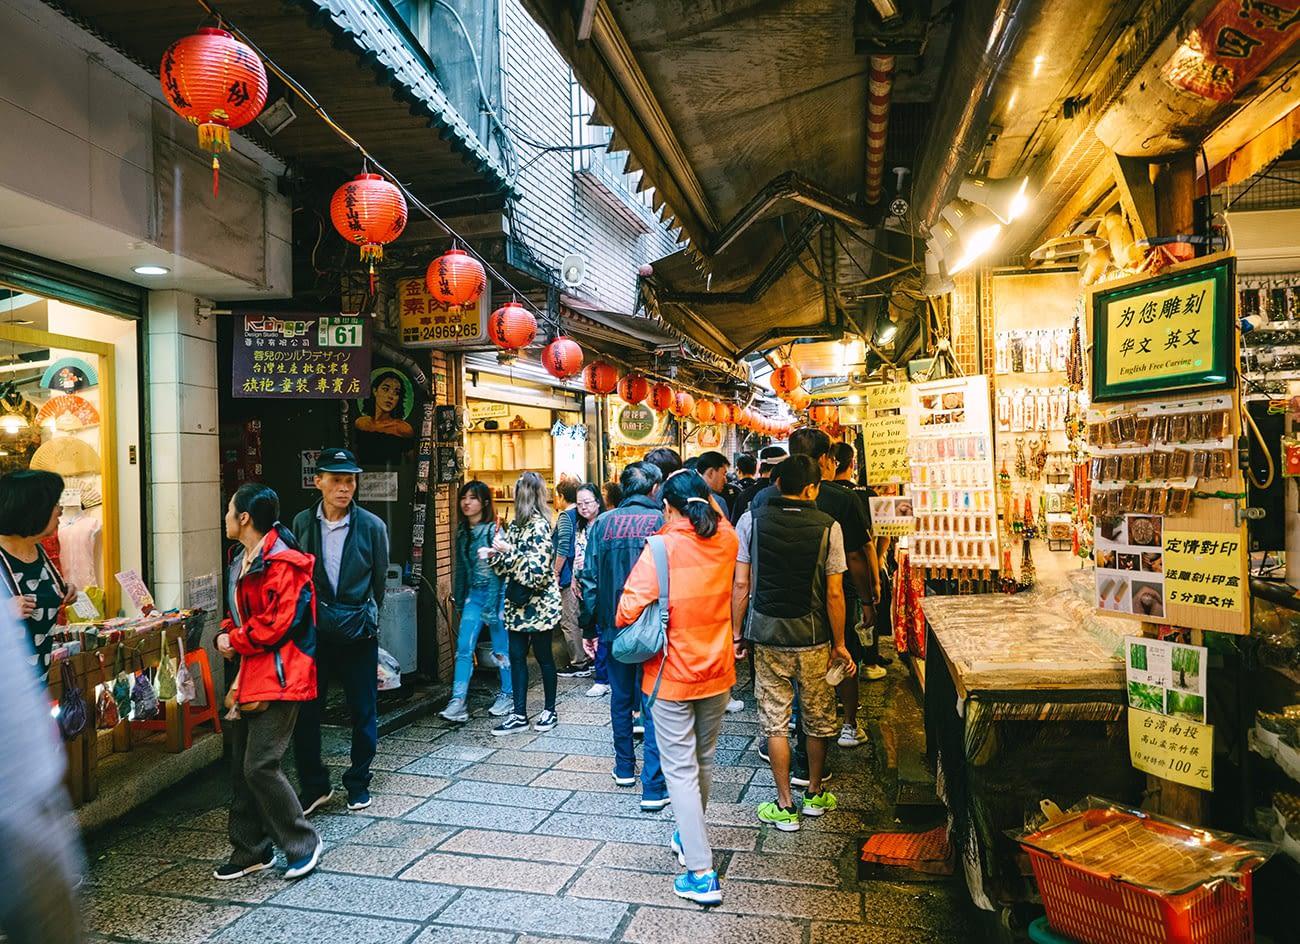 Taipei Jiufen - Narrow street